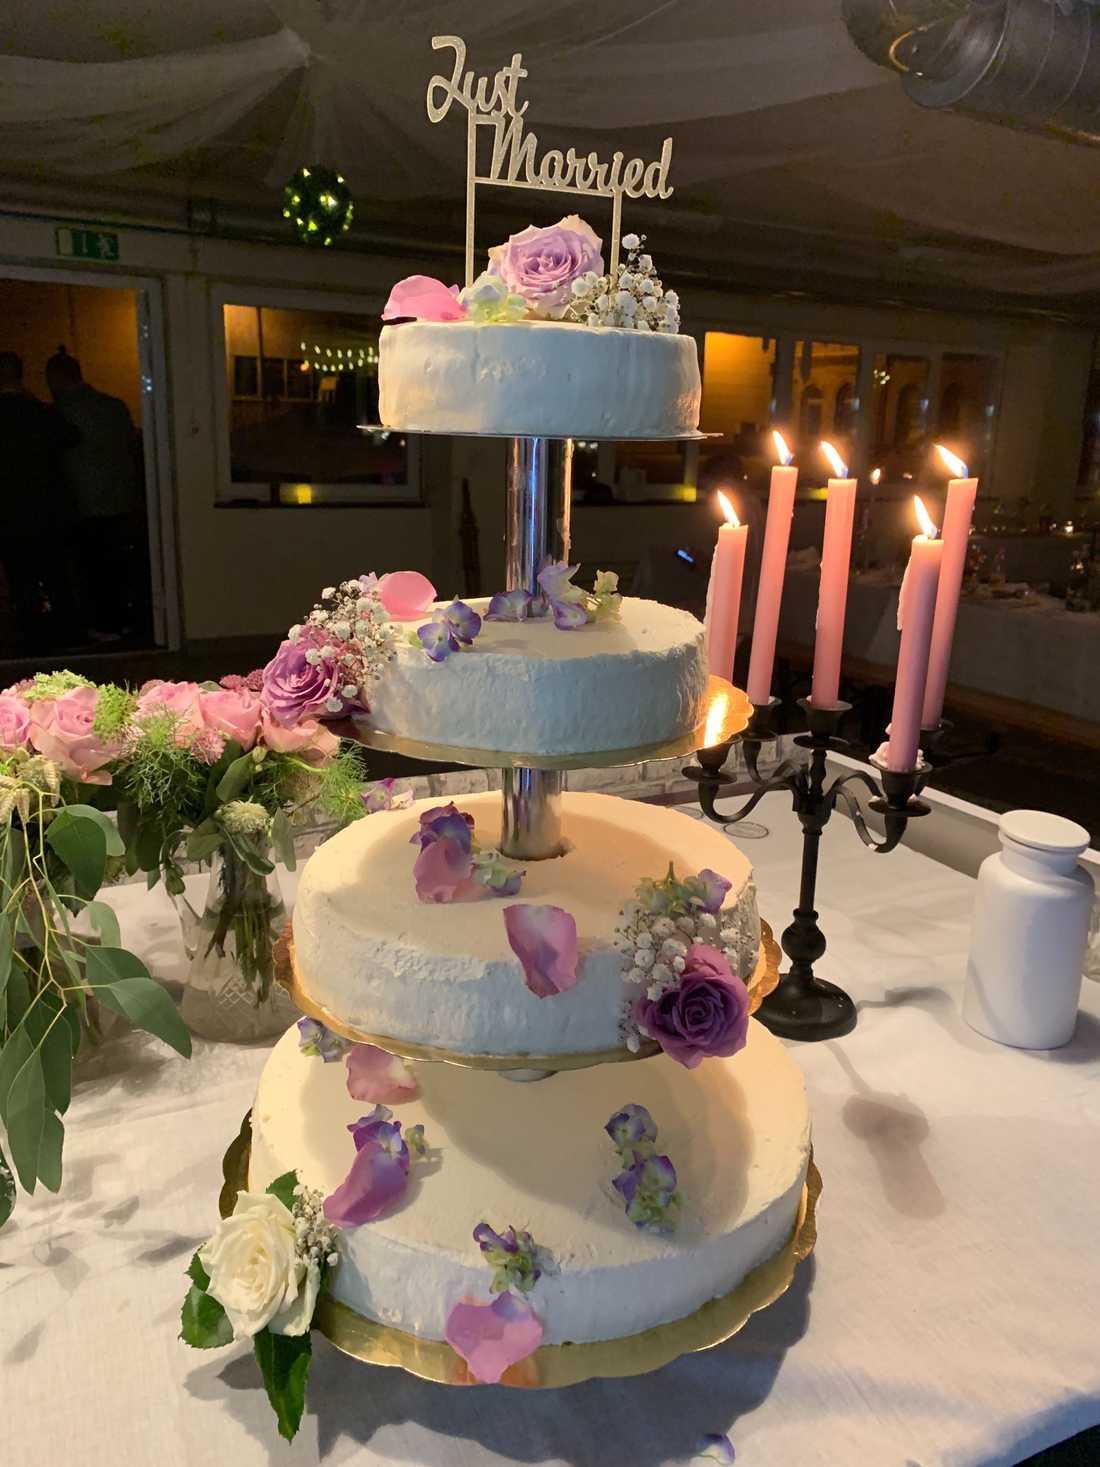 Bröllopstårtan, bakad av Frida Blums syster Linnéa Blum.